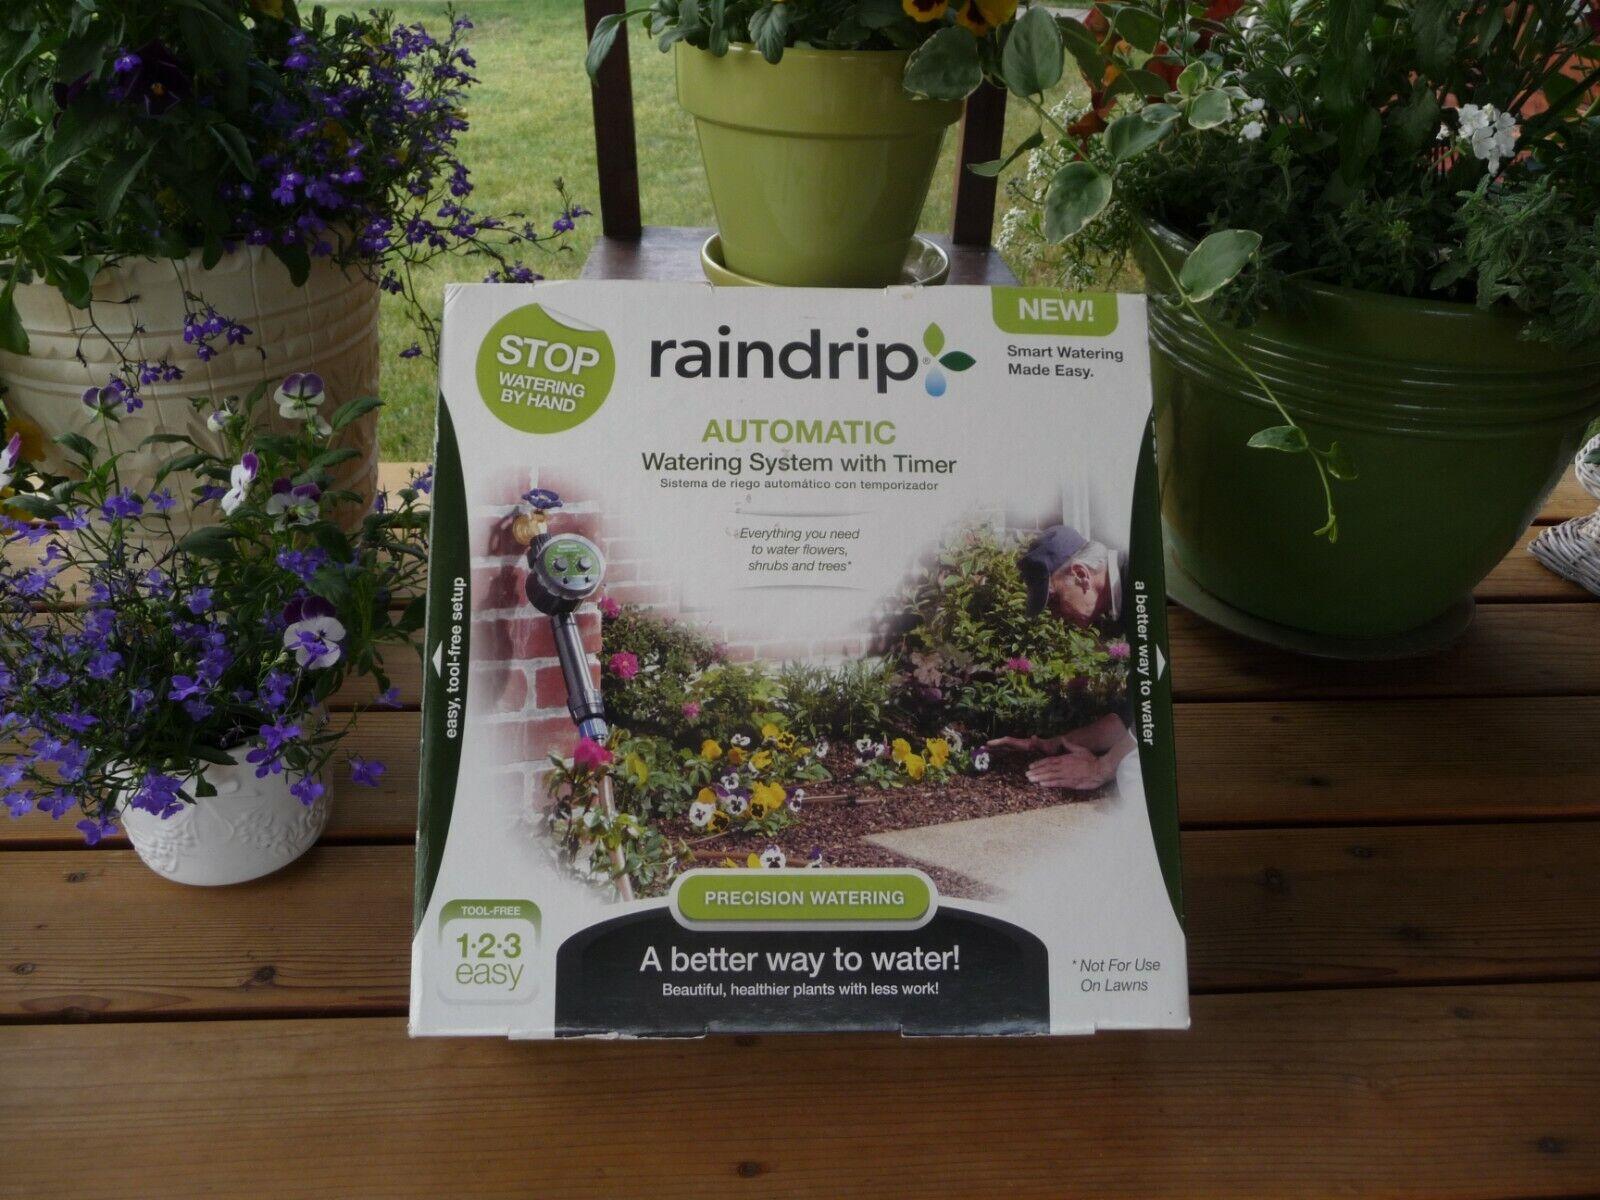 RAINDRIP AUTO WATERING SYSTEM - FLOWERS, TREES, SHRUBS W/TIMER - NEW